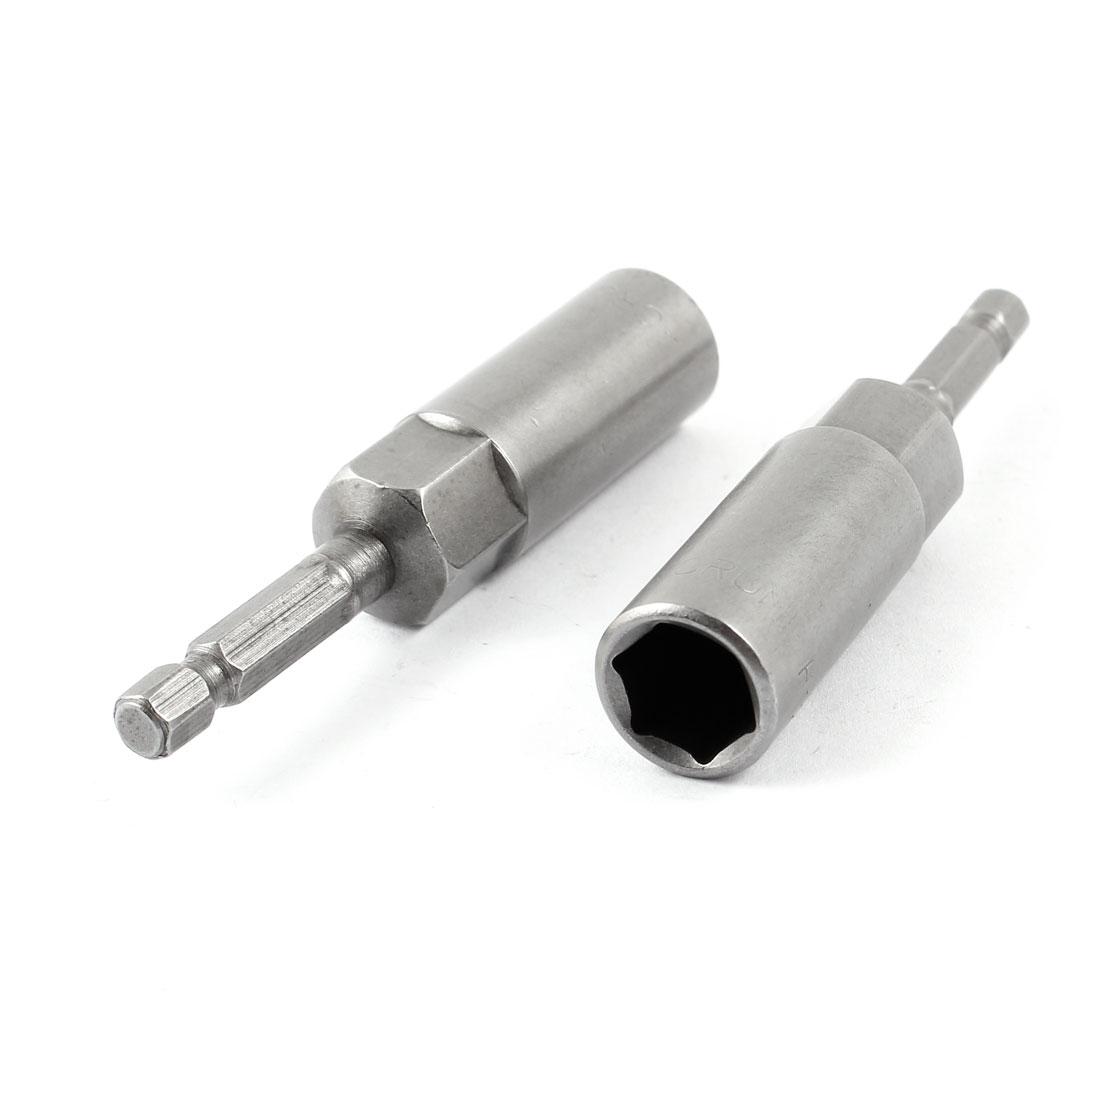 "2 Pcs Chrome-Vanadium 80mm Long 1/4"" Shank 12mm Hex Socket Nut Driver Bit"